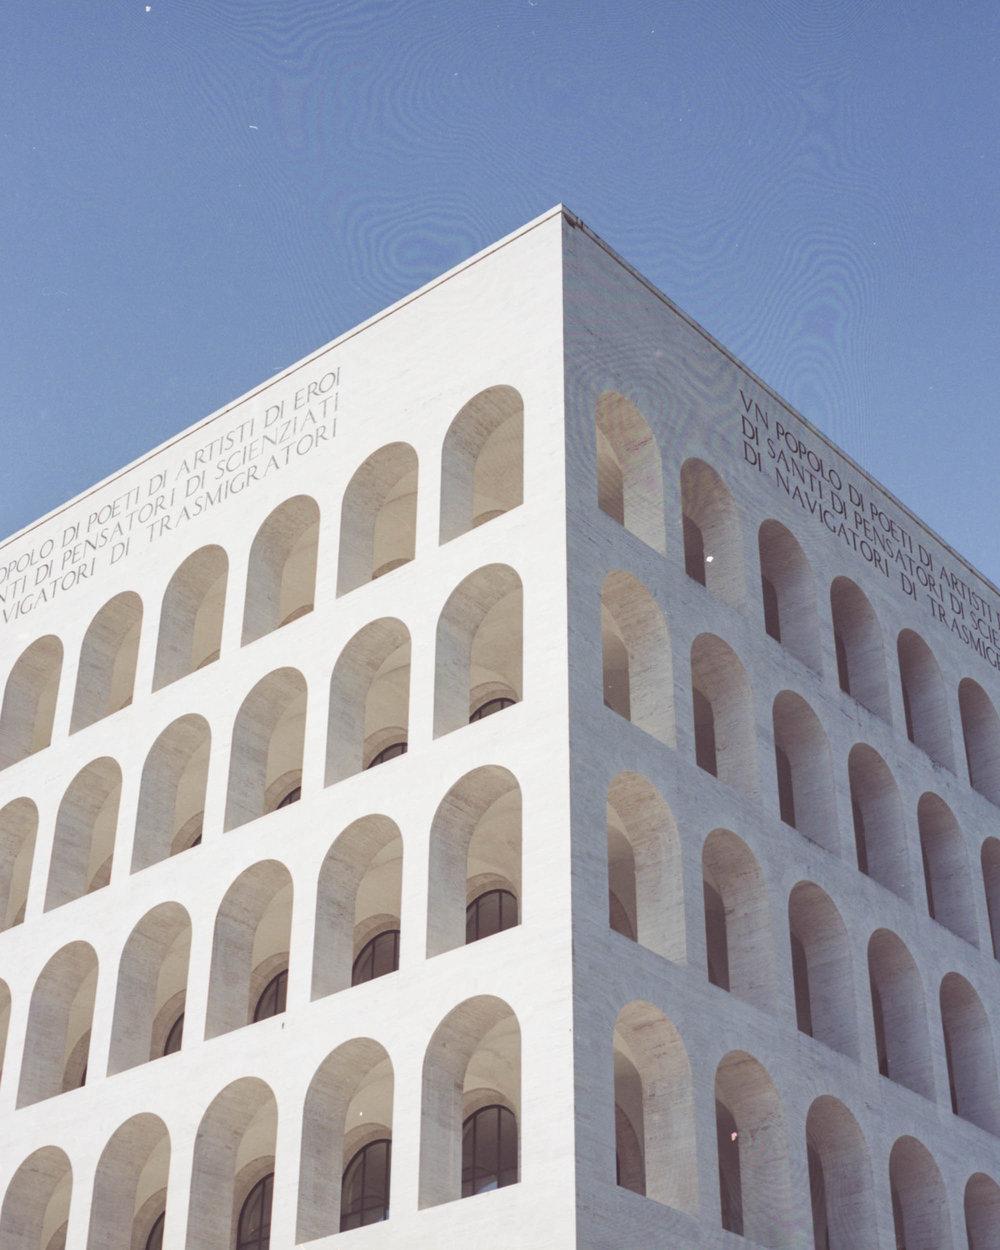 Fendi: Global Headquarters, Rome / Photography